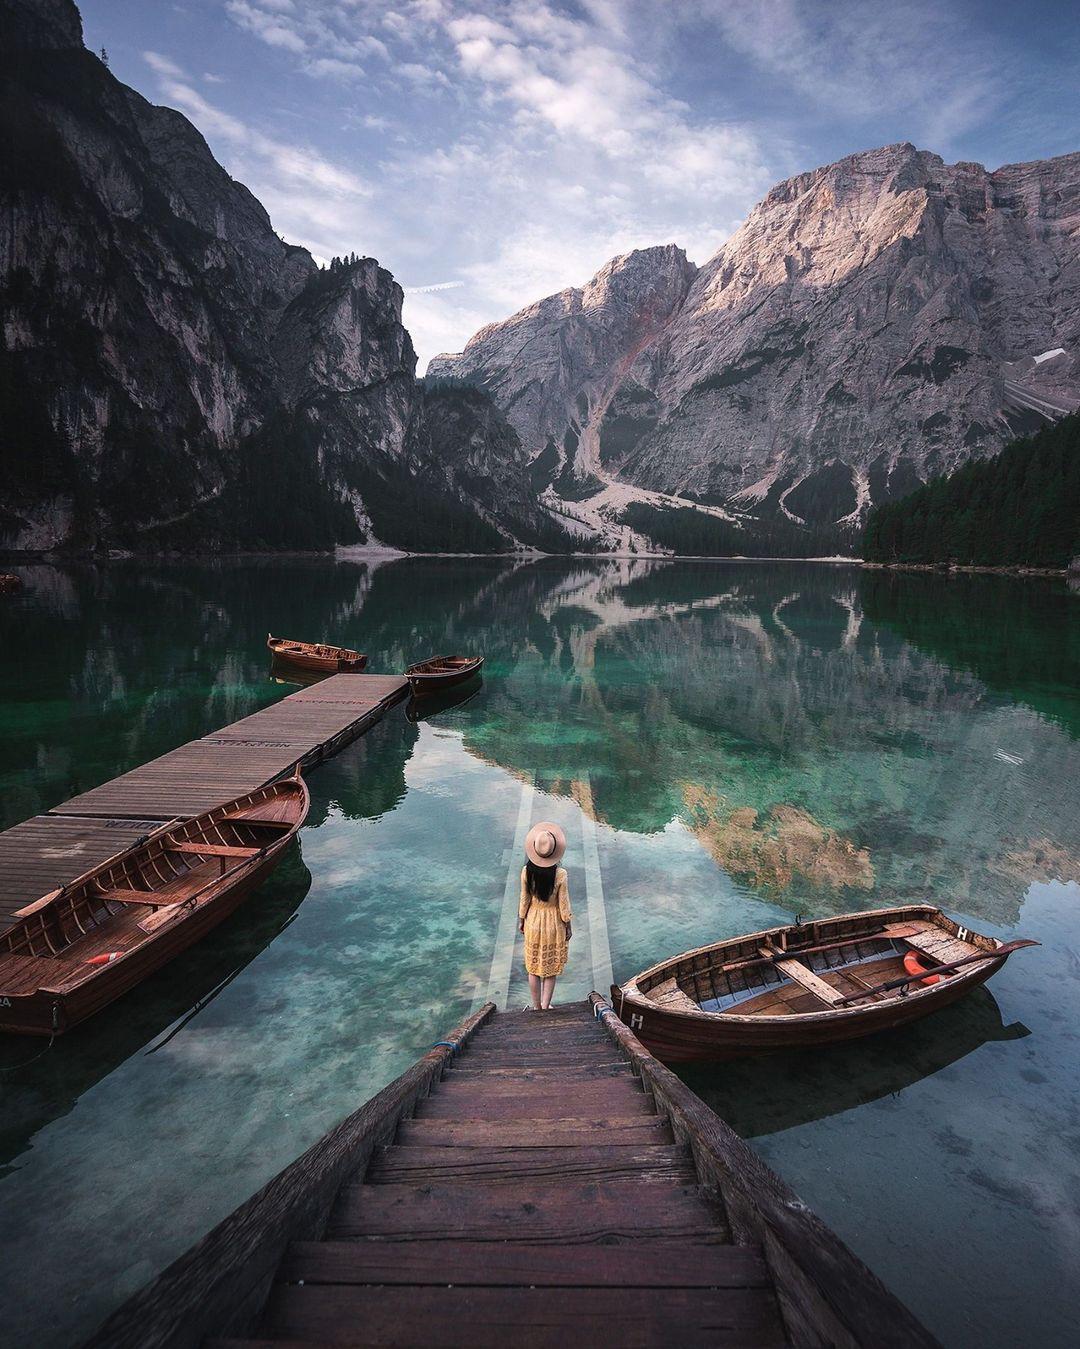 Природа и путешествия на снимках Иштвана Геренсера